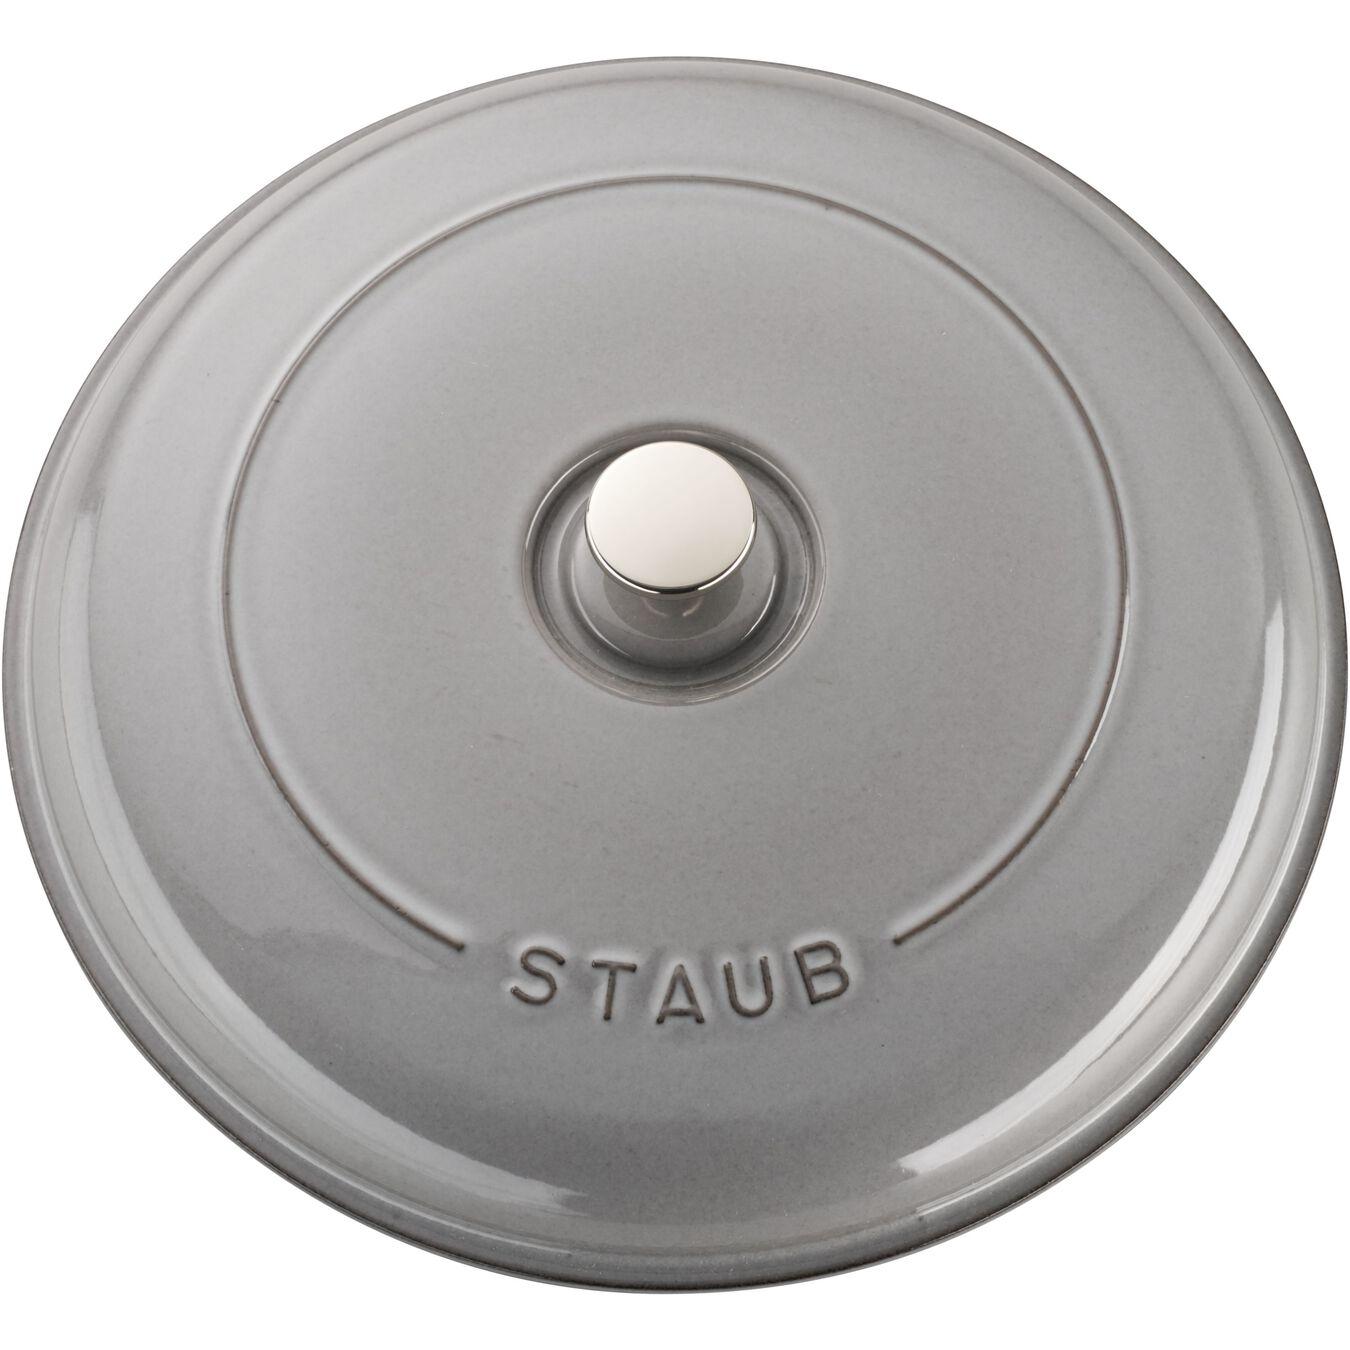 12-inch, Saute pan, graphite grey,,large 3